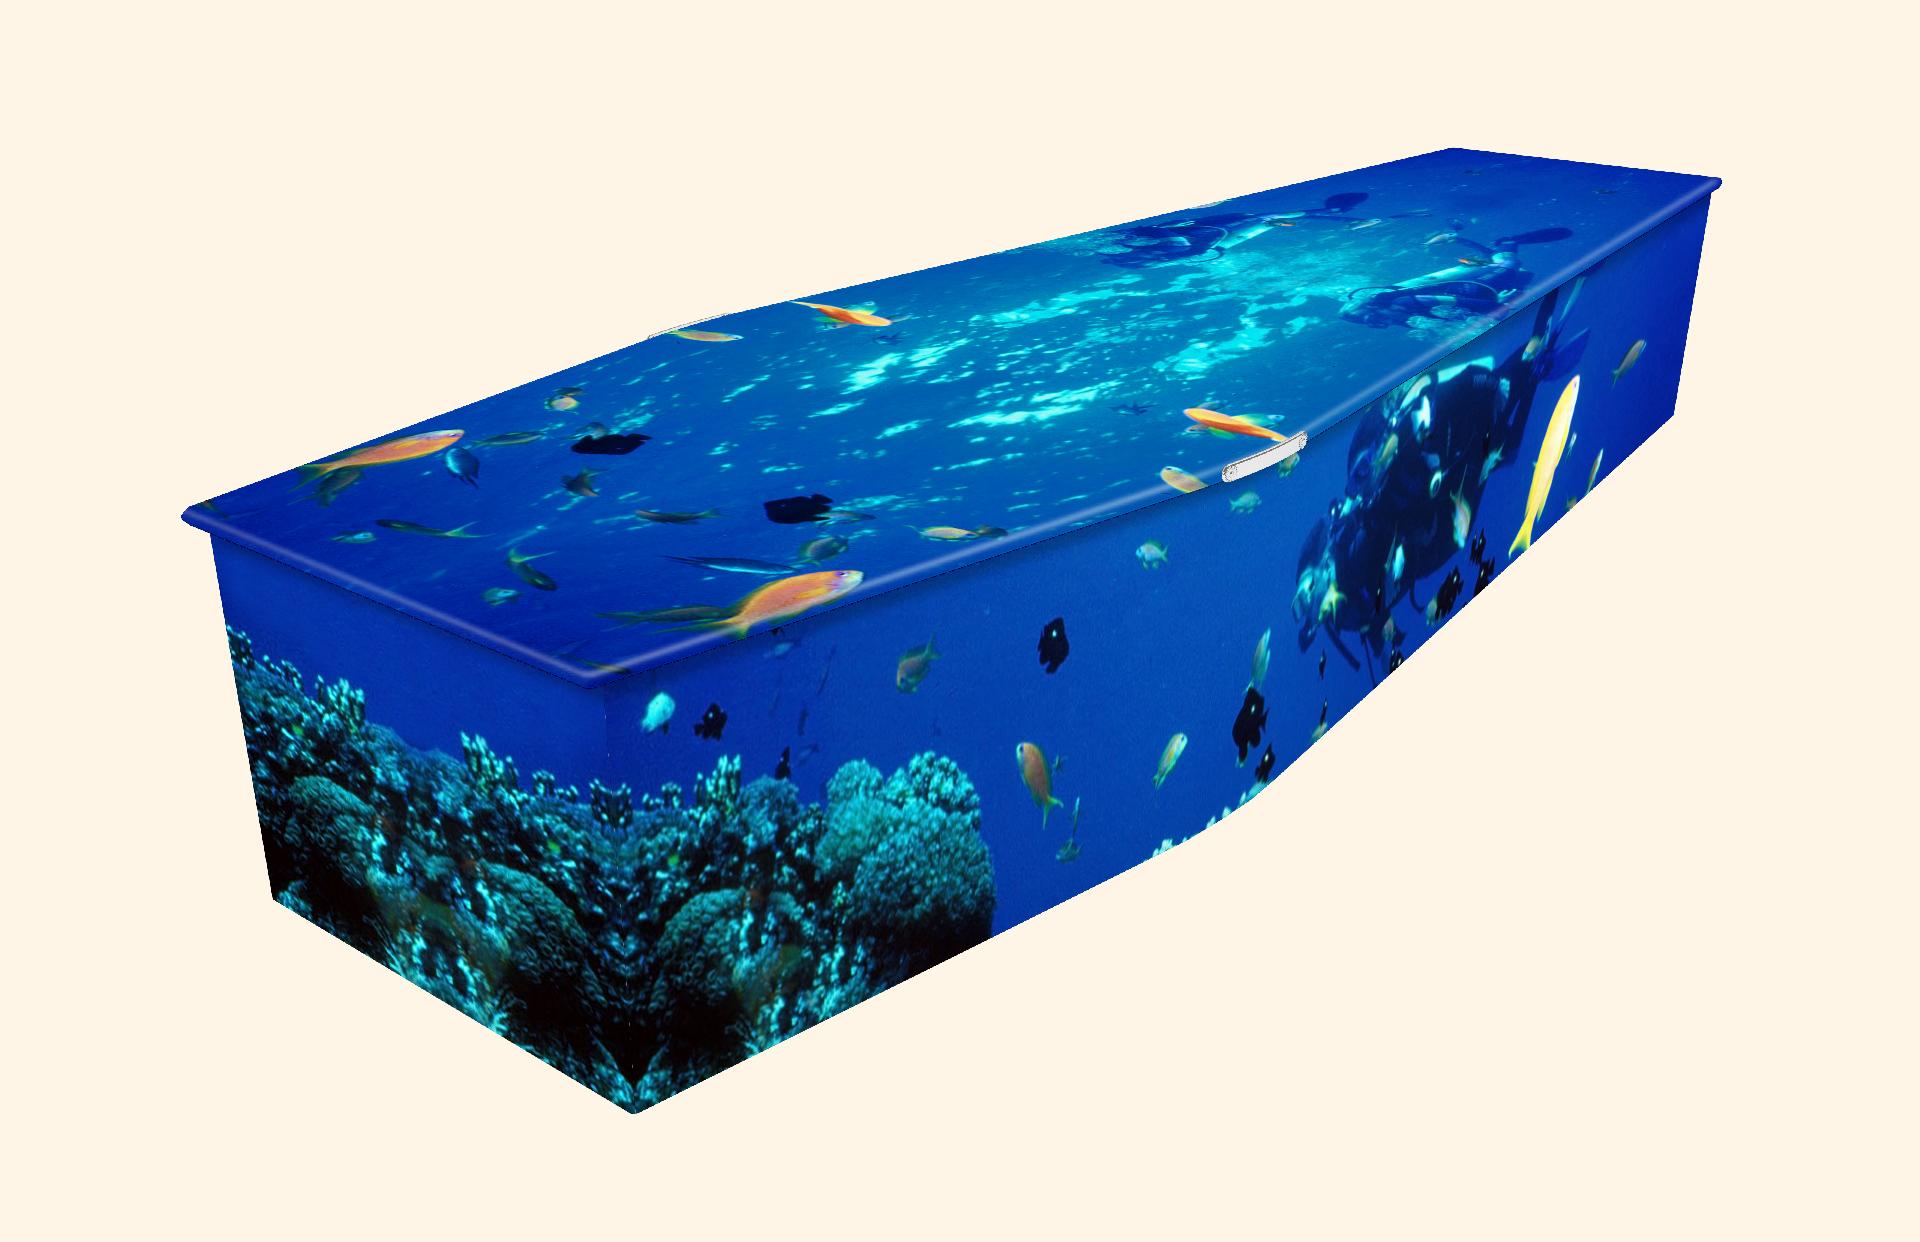 The Scuba Diver